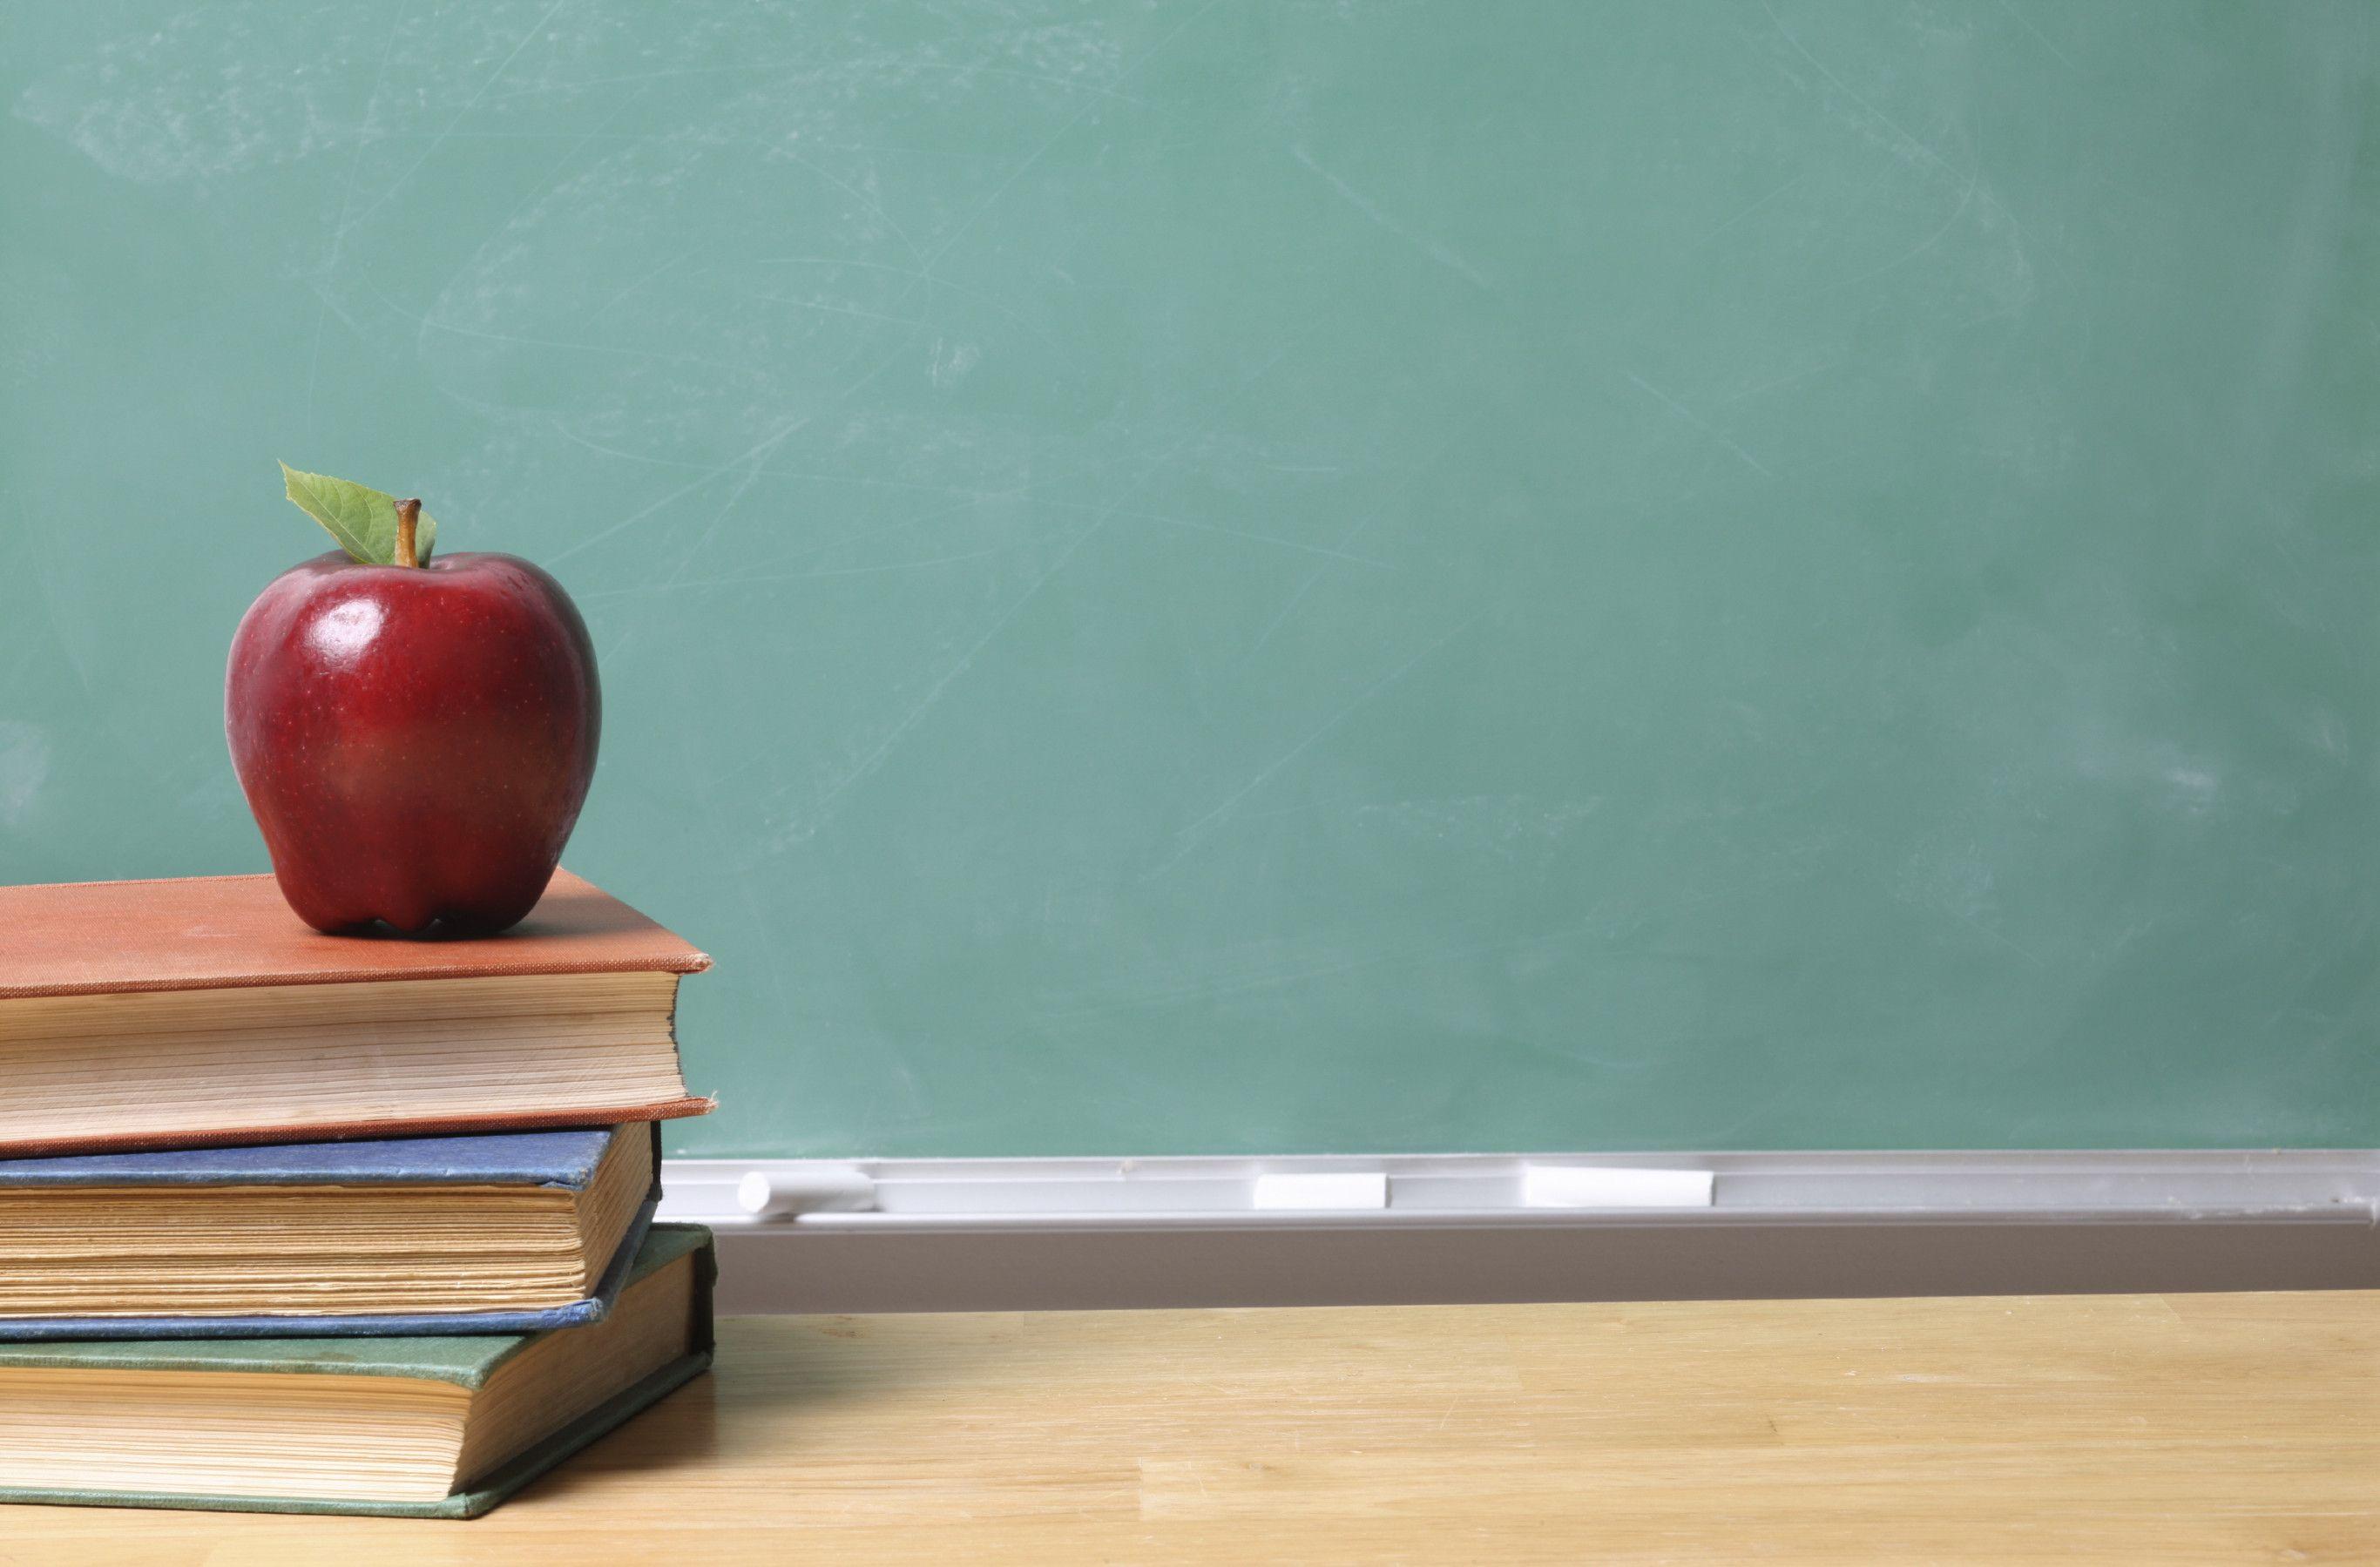 School Wallpaper Collection For Free Download Effective Classroom Management School Board Classroom Management Strategies